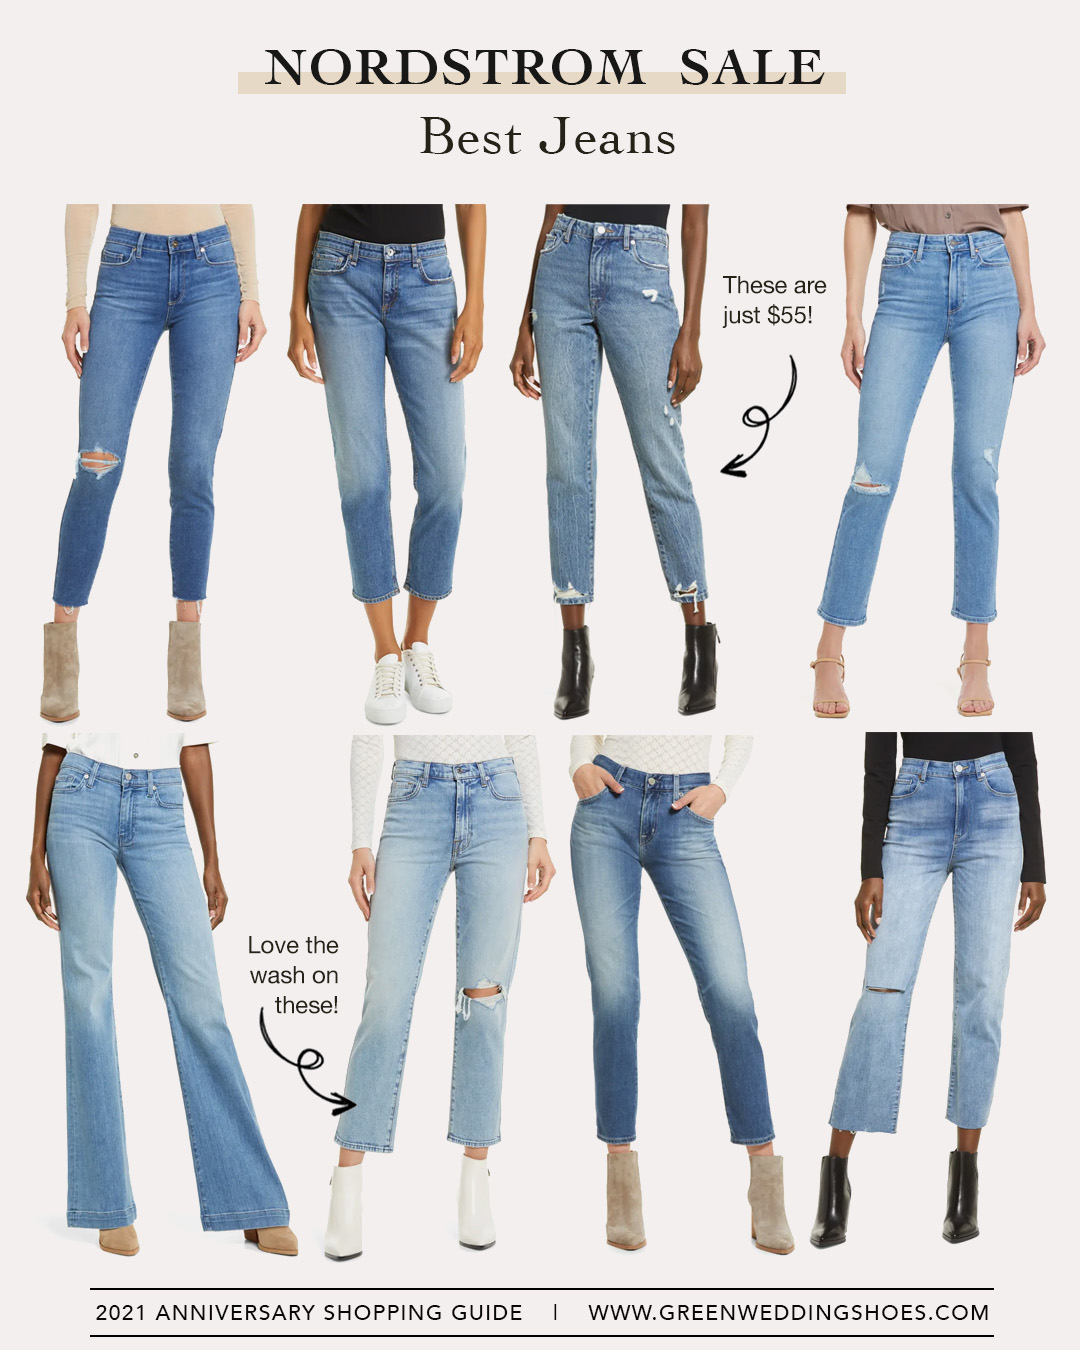 Nordstrom Sale Best Jeans